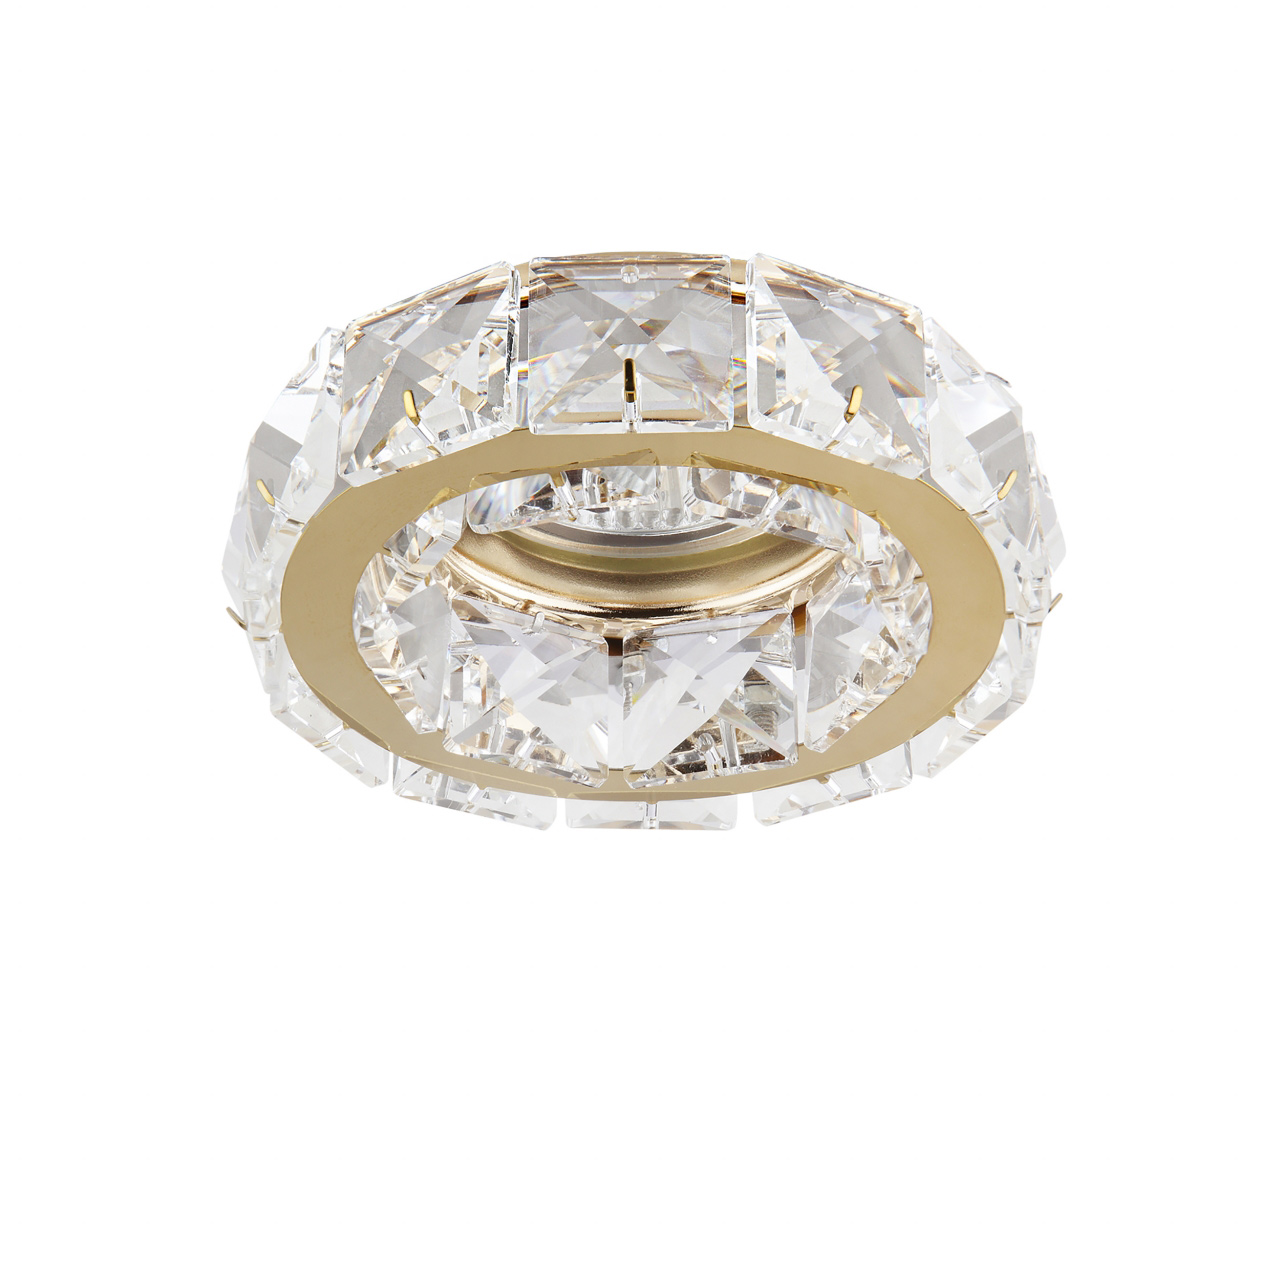 Светильник Onda MR16 / HP16 золото / хрусталь прозрачный Lightstar 032702